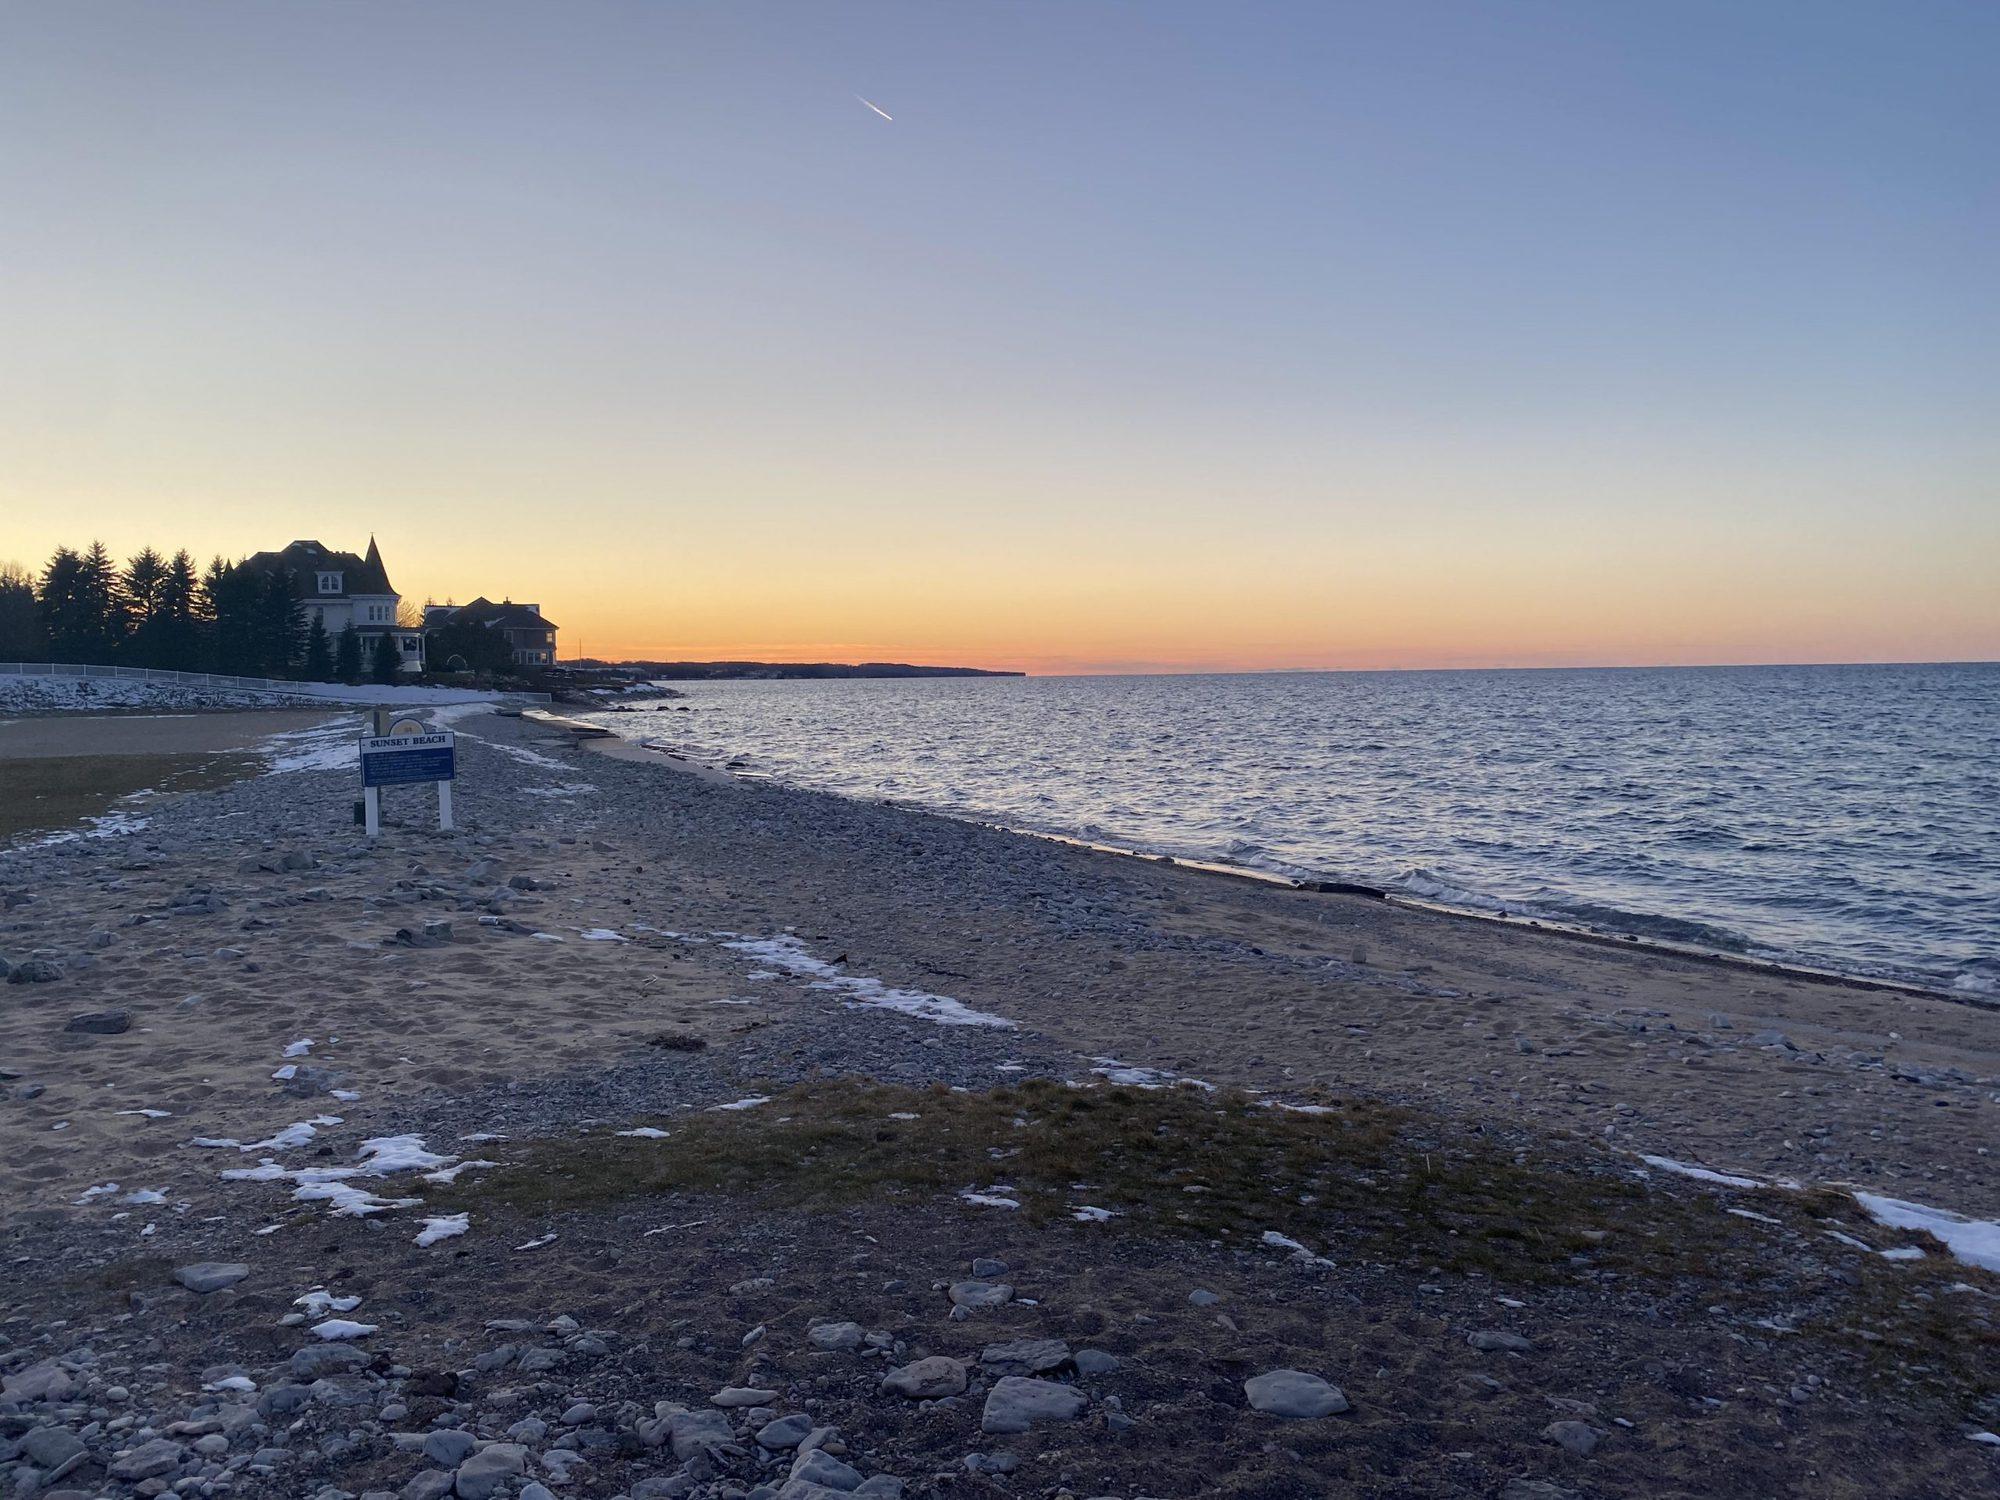 winter sunset over Lake Michigan |Inn at Bay Harbor by popular Michigan travel blog, The House of Navy: image of Sunset Beach Michigan.